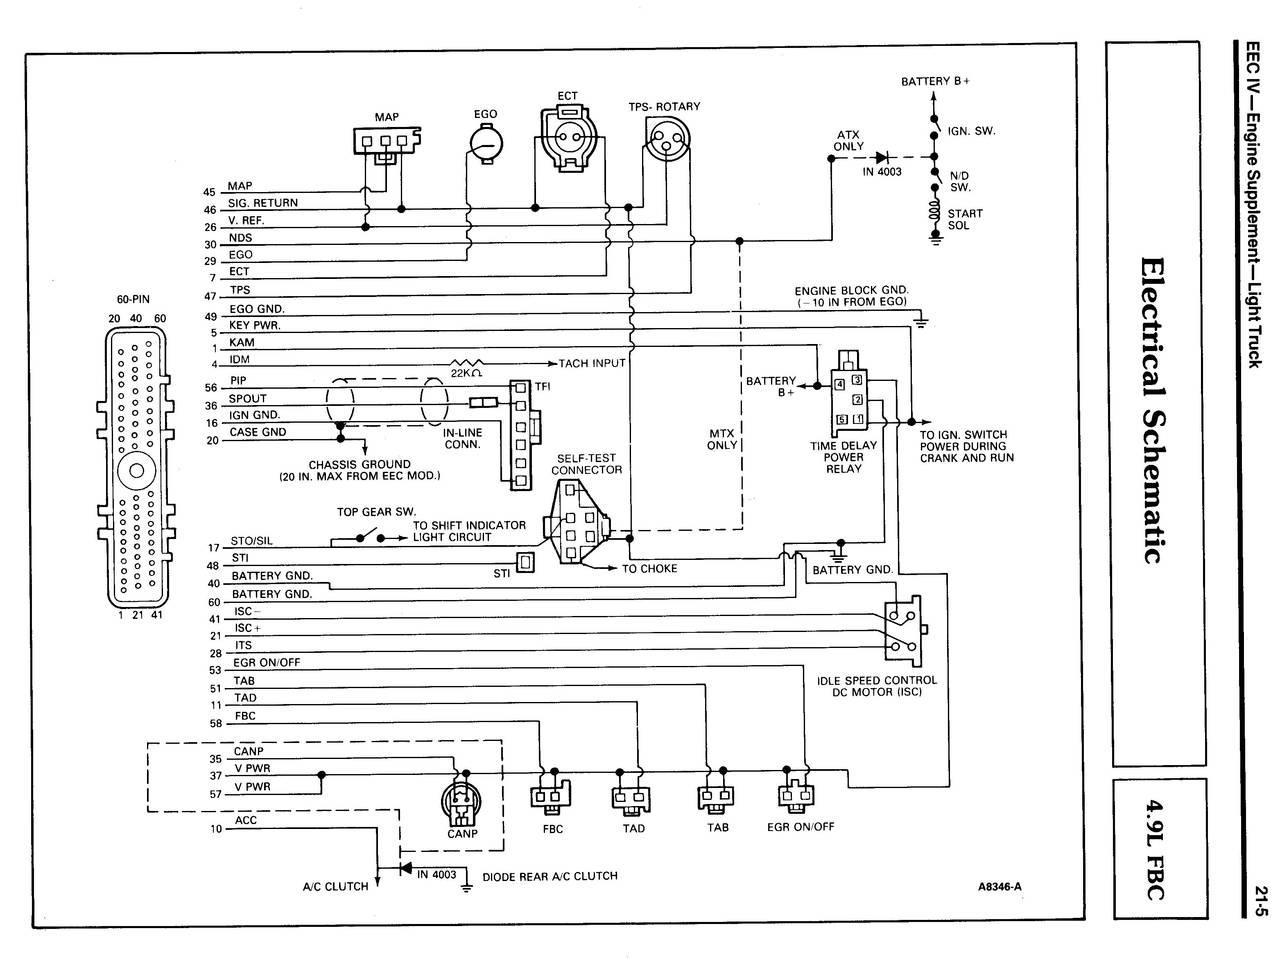 Ford Eec V Wiring Diagram   Online Wiring Diagram